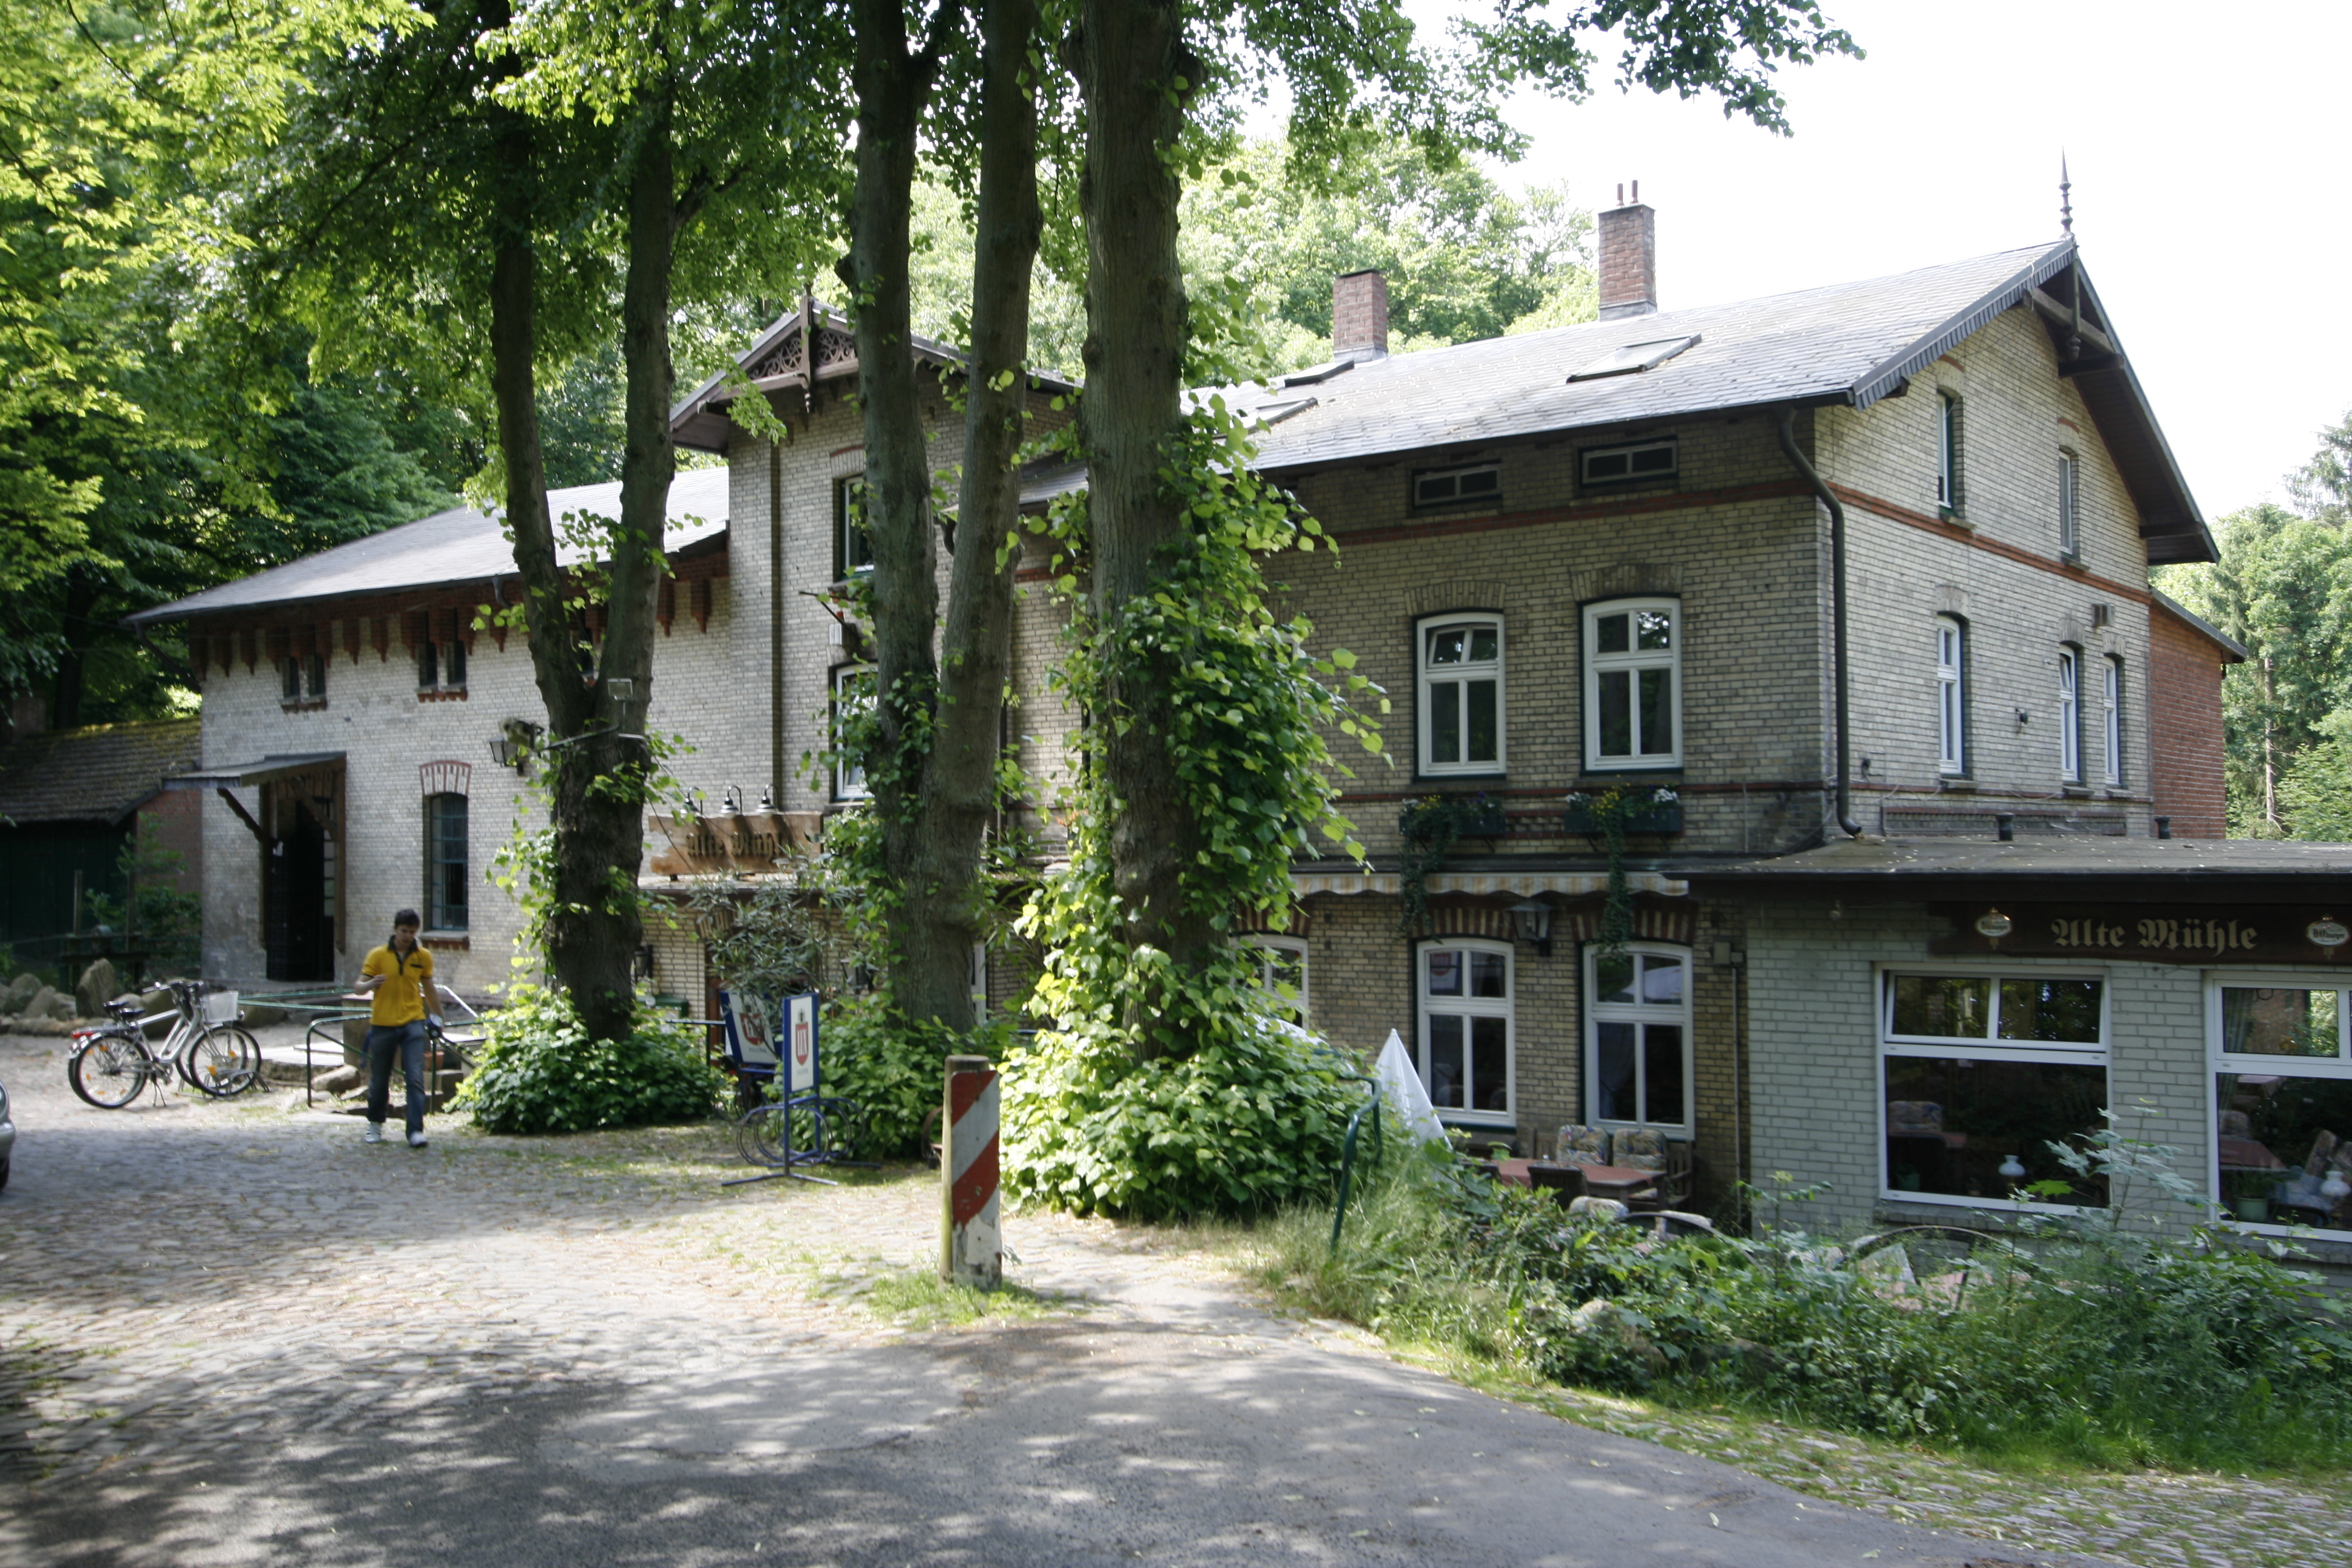 Bezirksamt Wandsbek Bilddatenbank Bergstedt Fhh